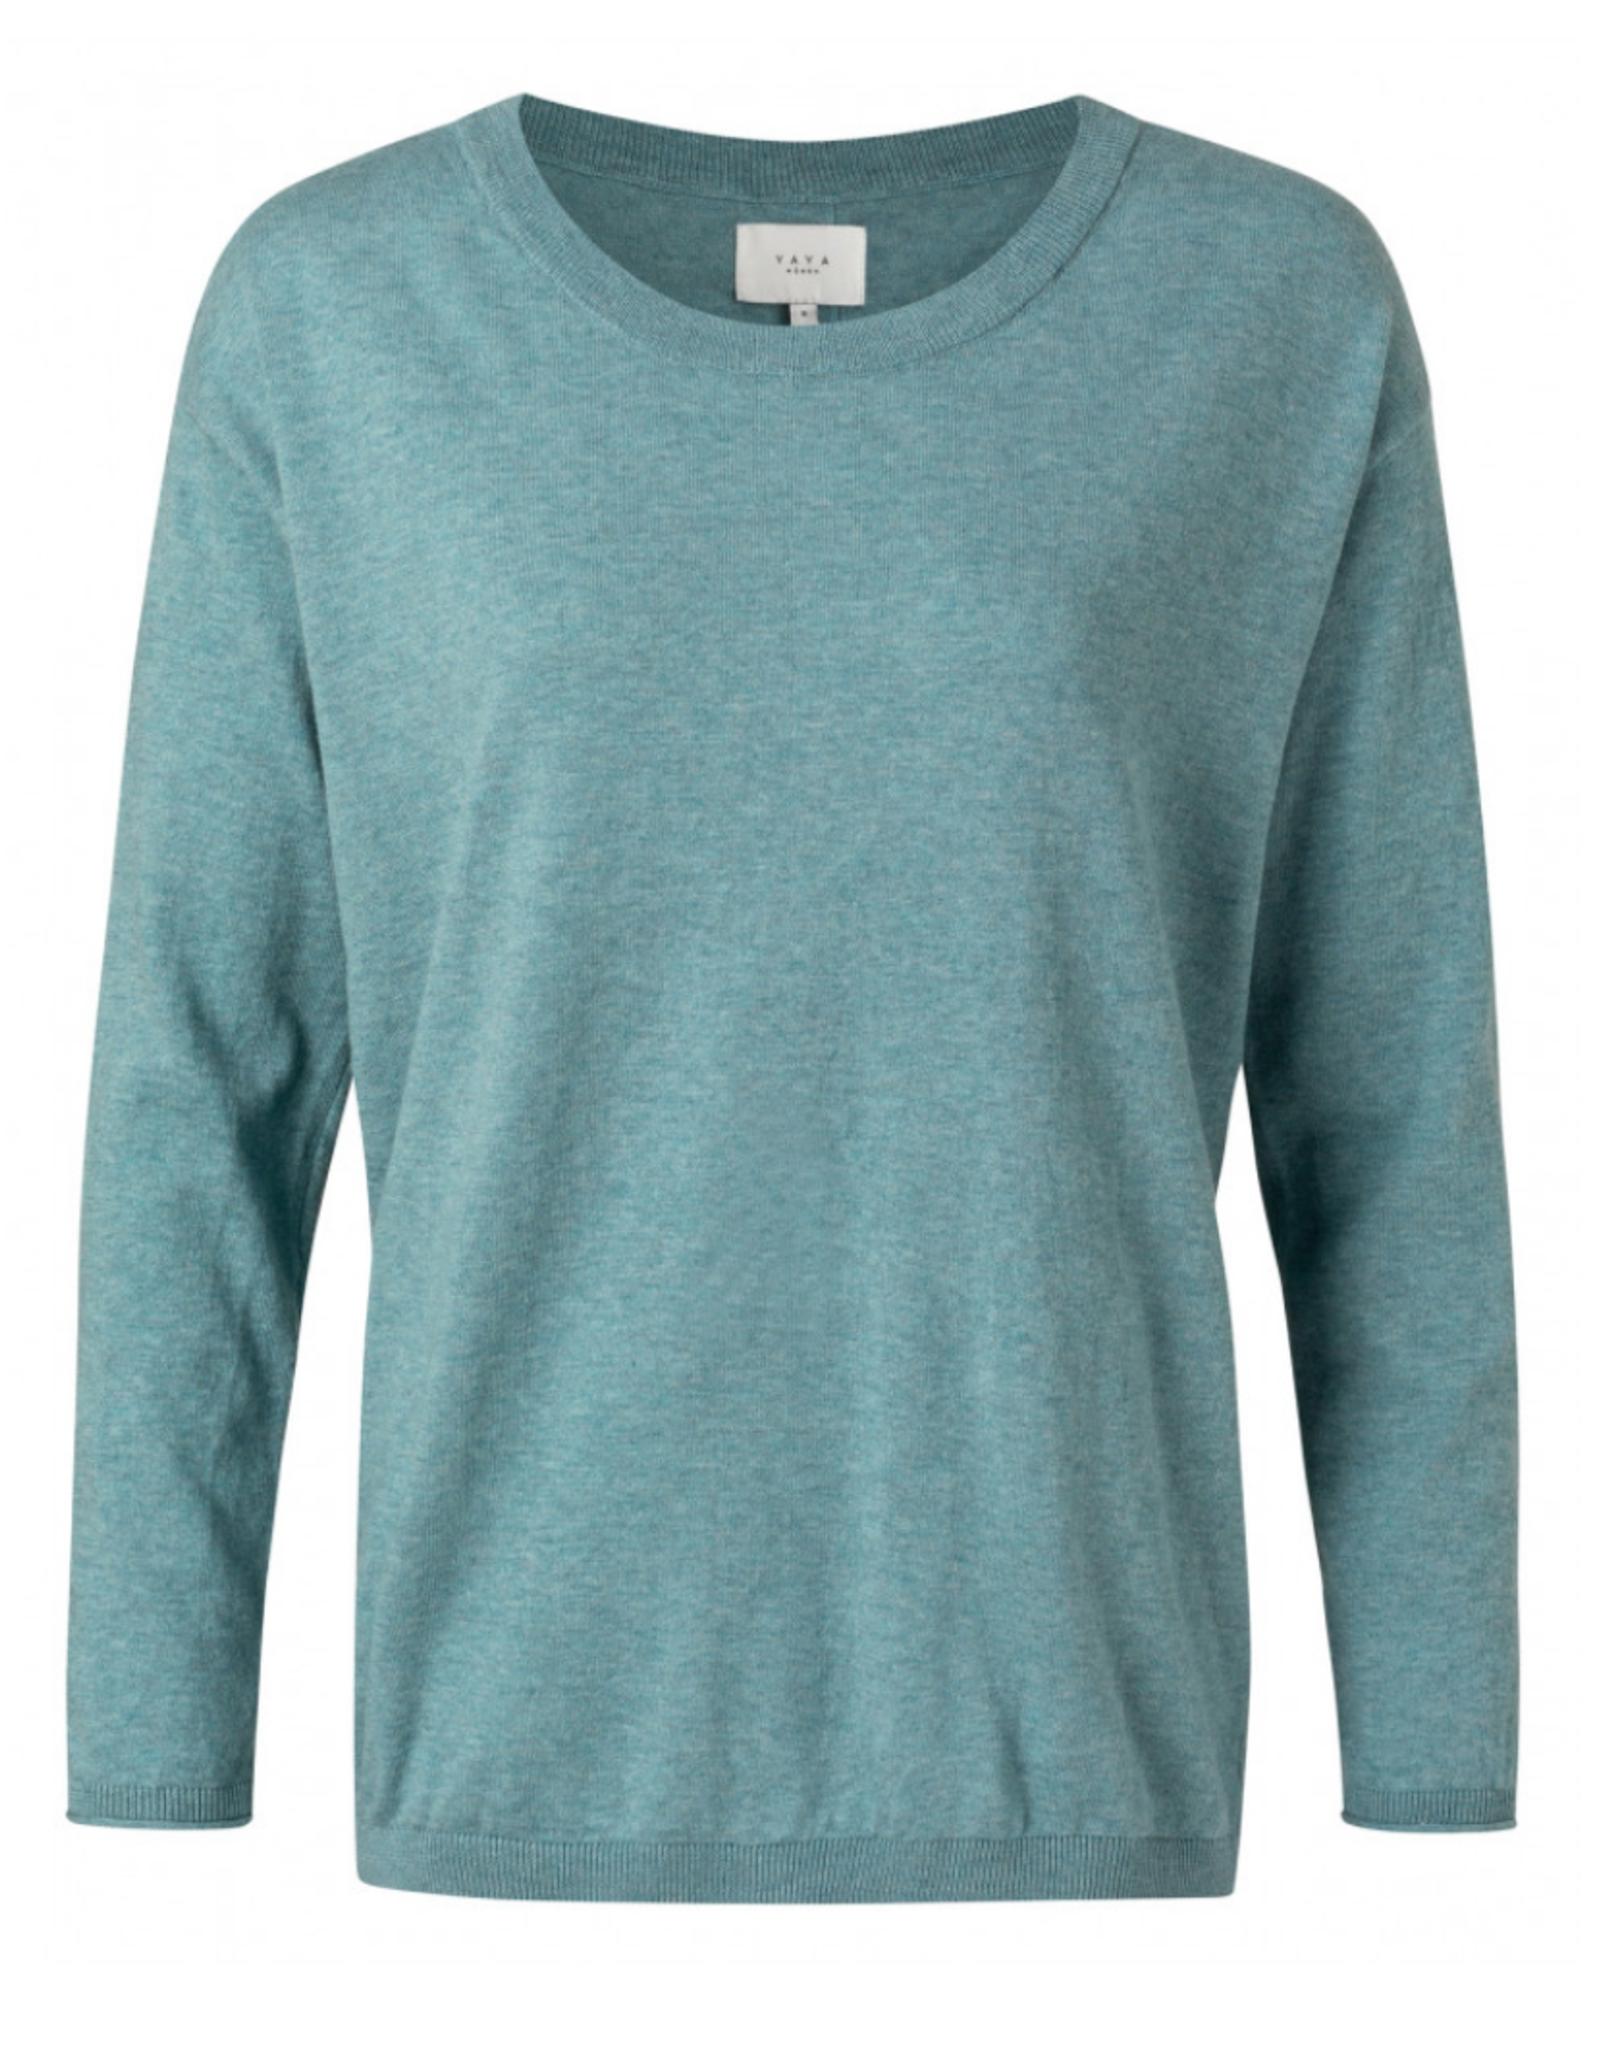 Yaya Sweater w/ Back Buttons Rainy Sky